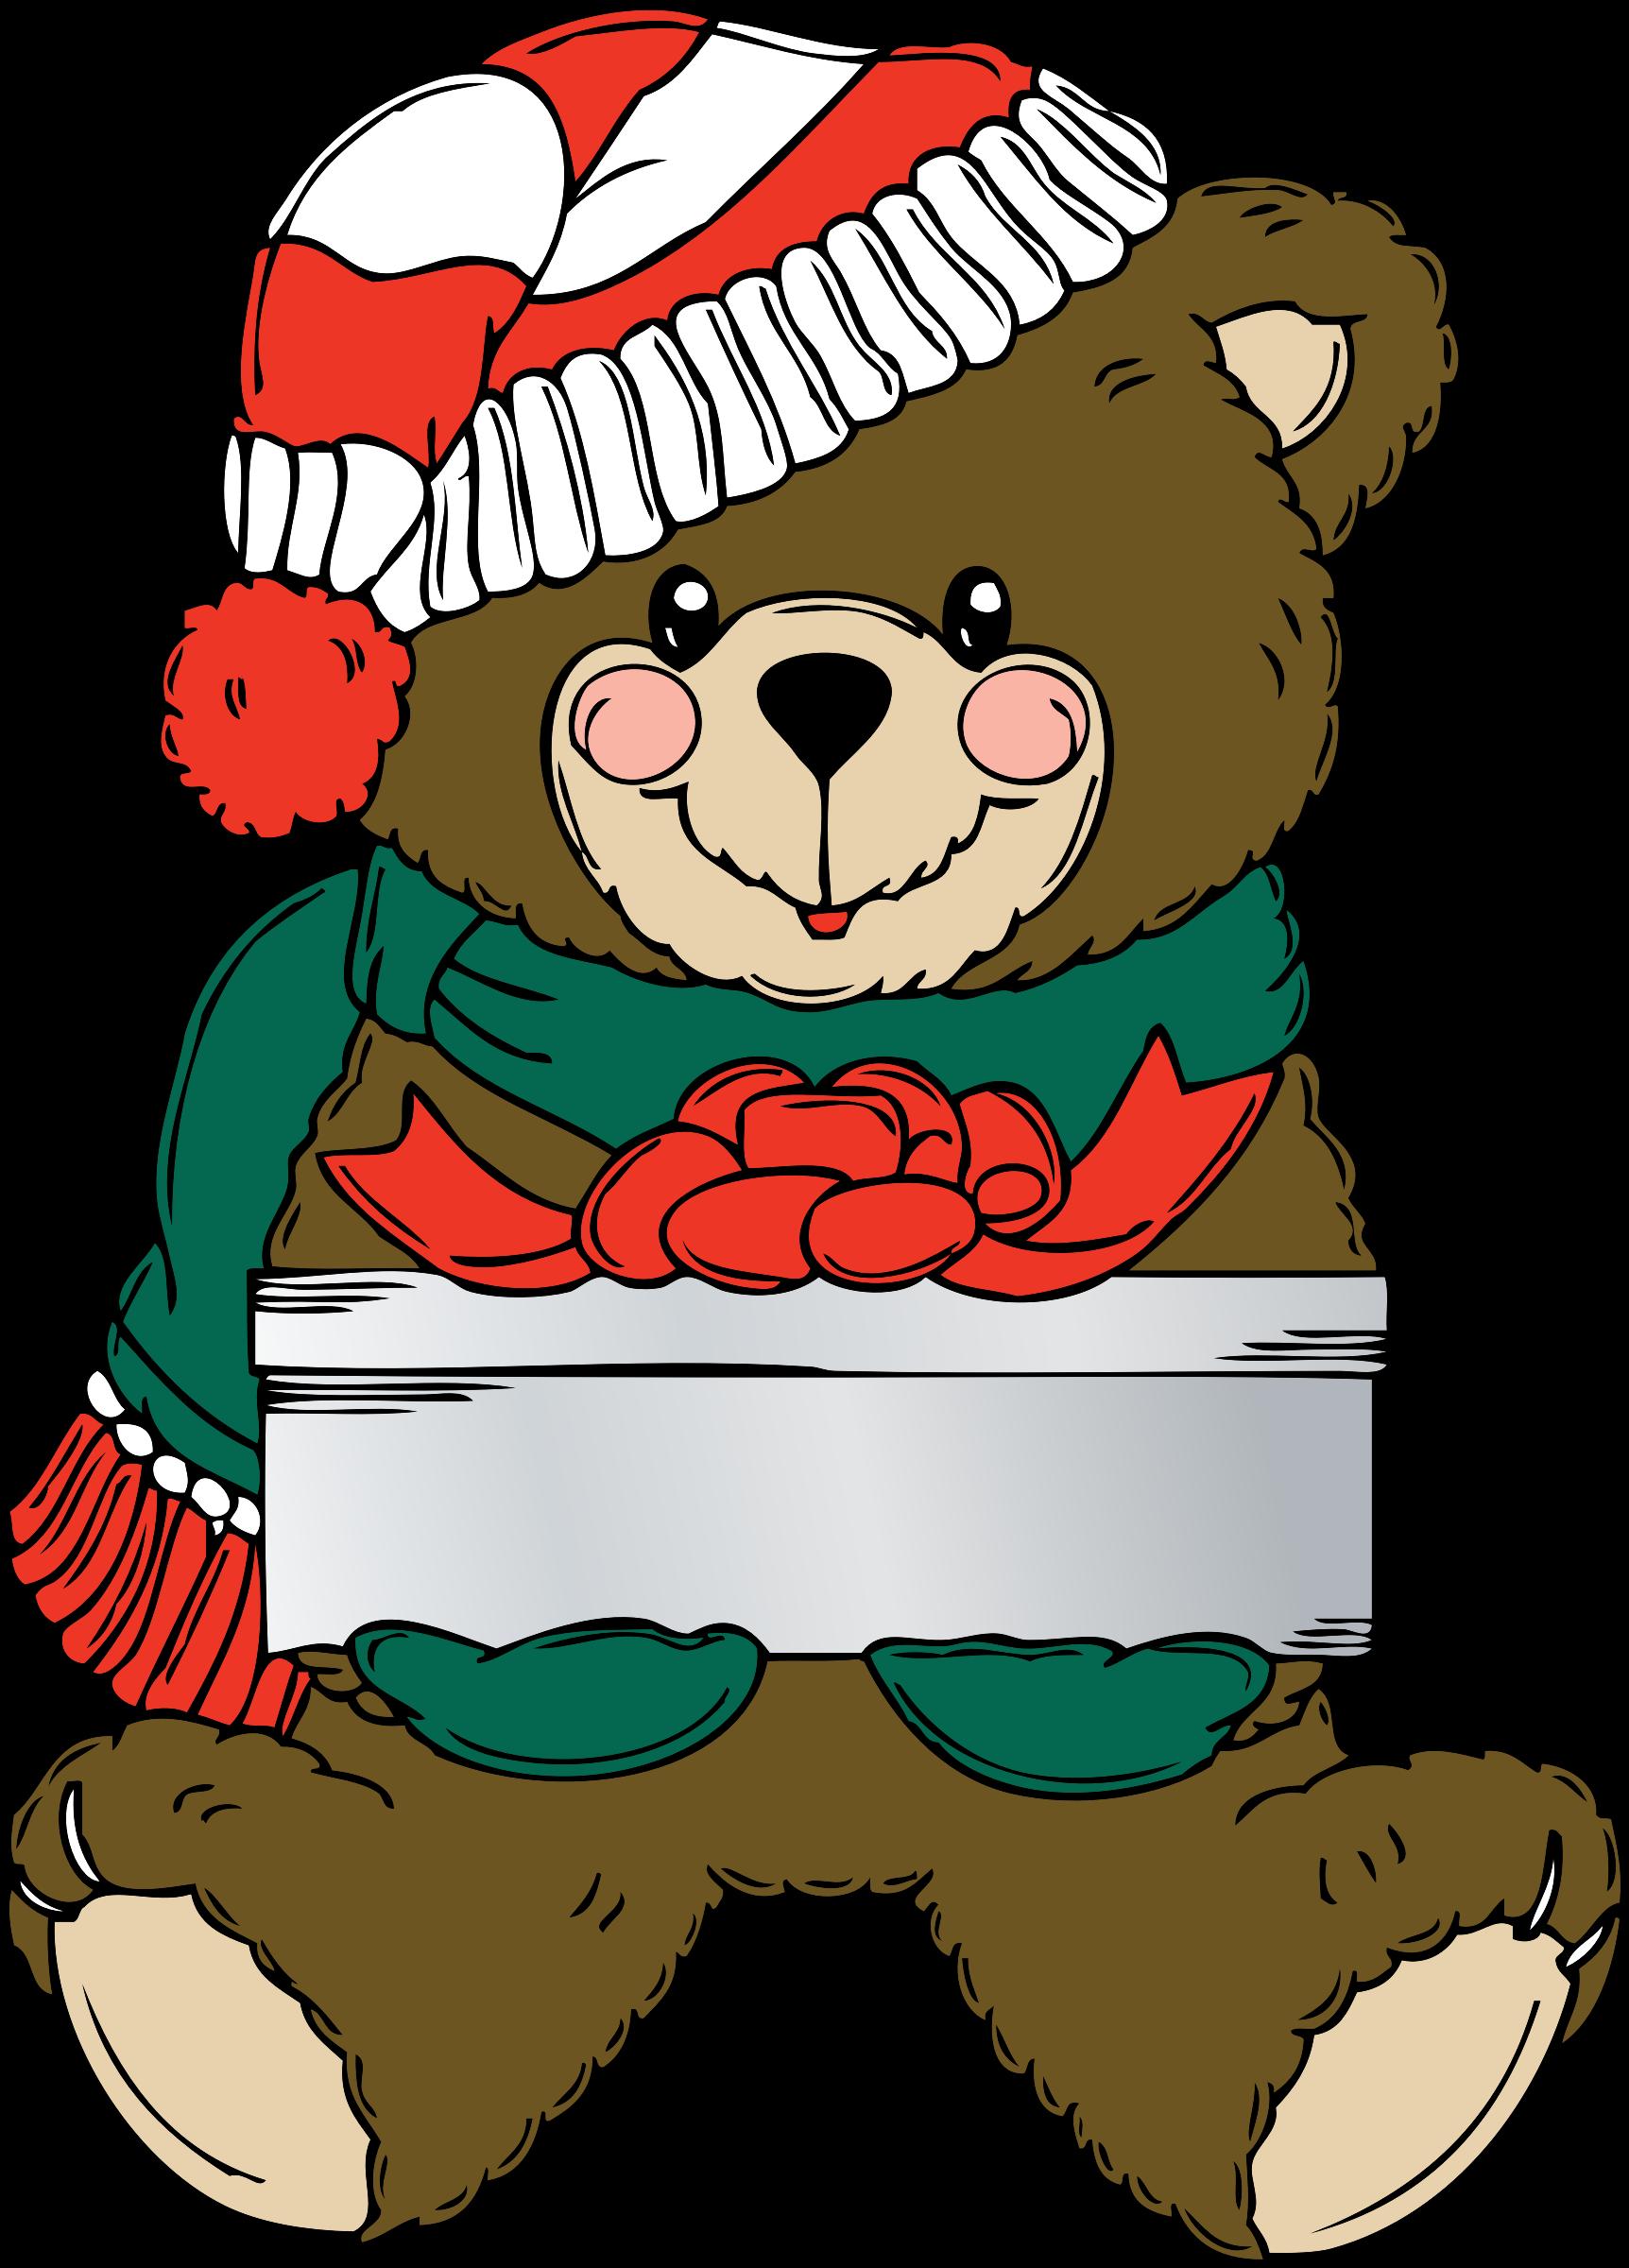 Christmas bear clipart banner royalty free Clipart - Christmas Bear wih present banner royalty free